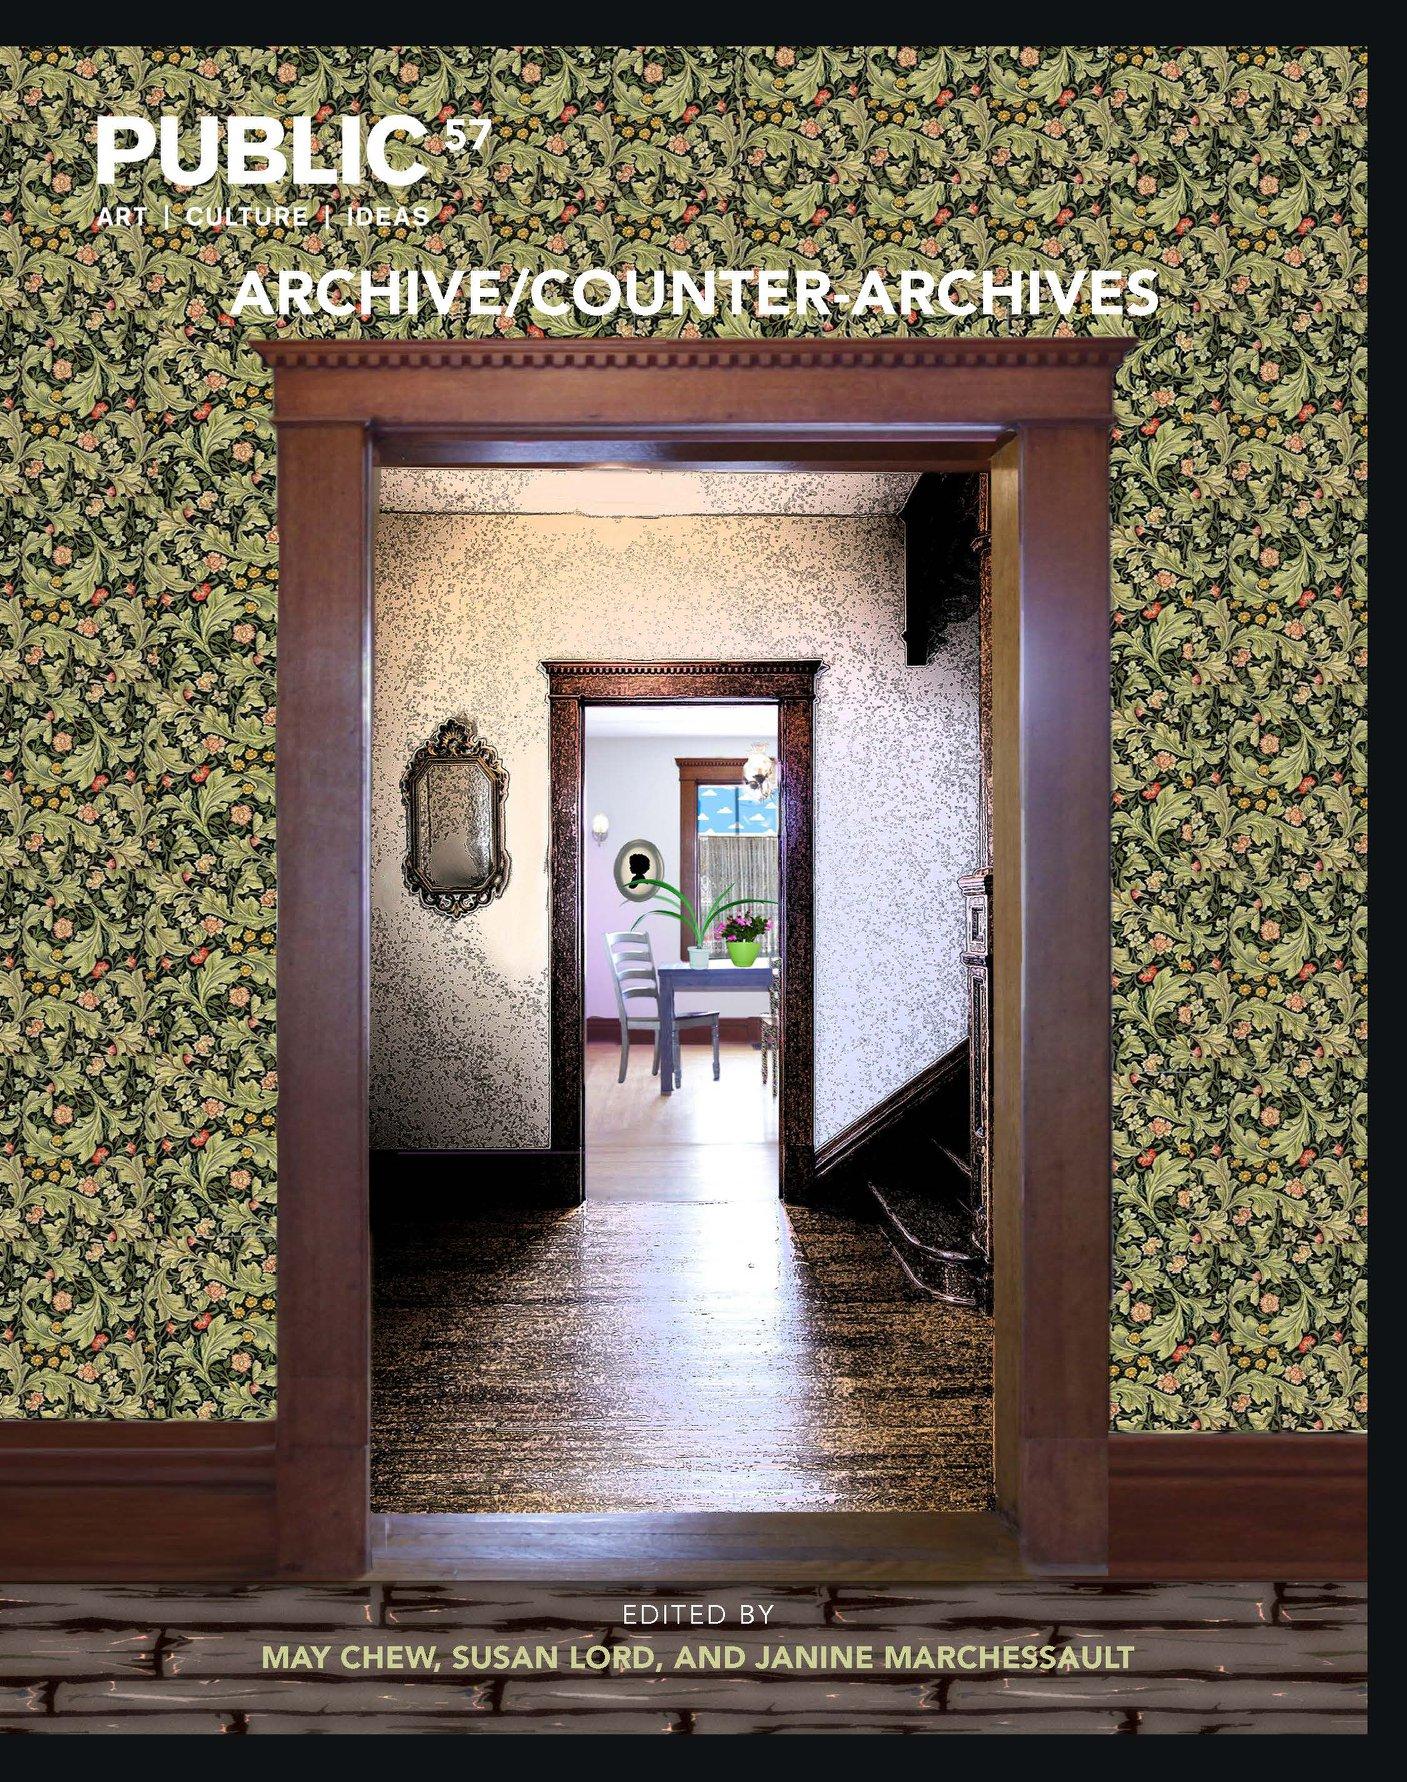 PUBLIC 57: Archive/Counter Archives